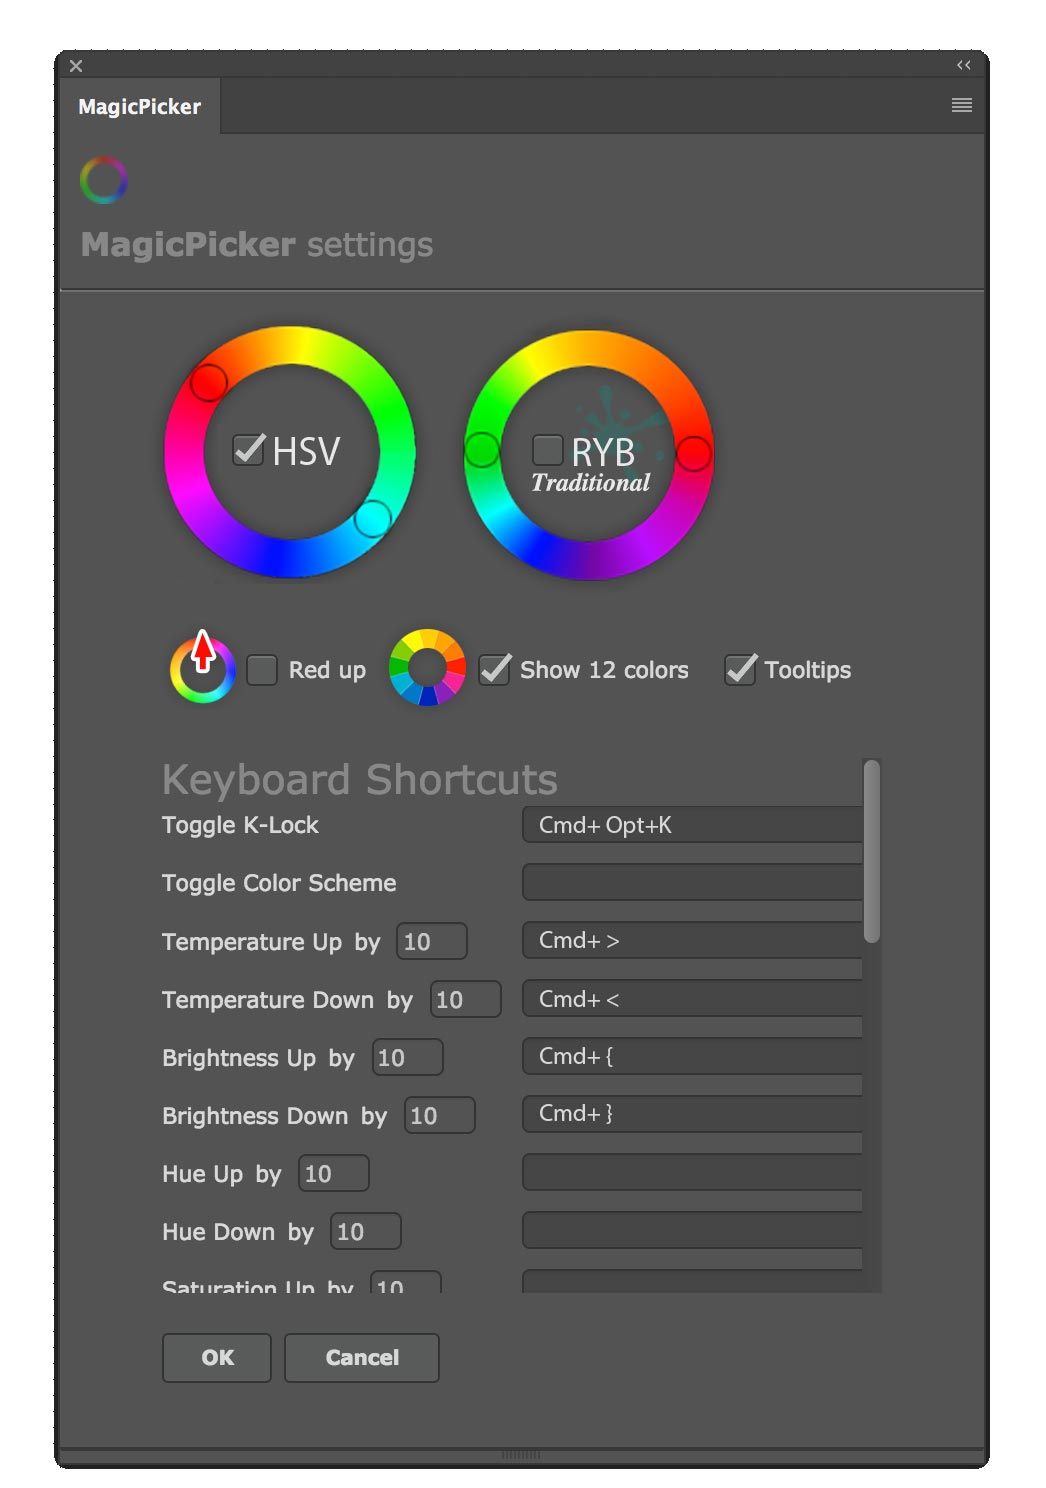 MagicPicker - assign keyboard shortcuts